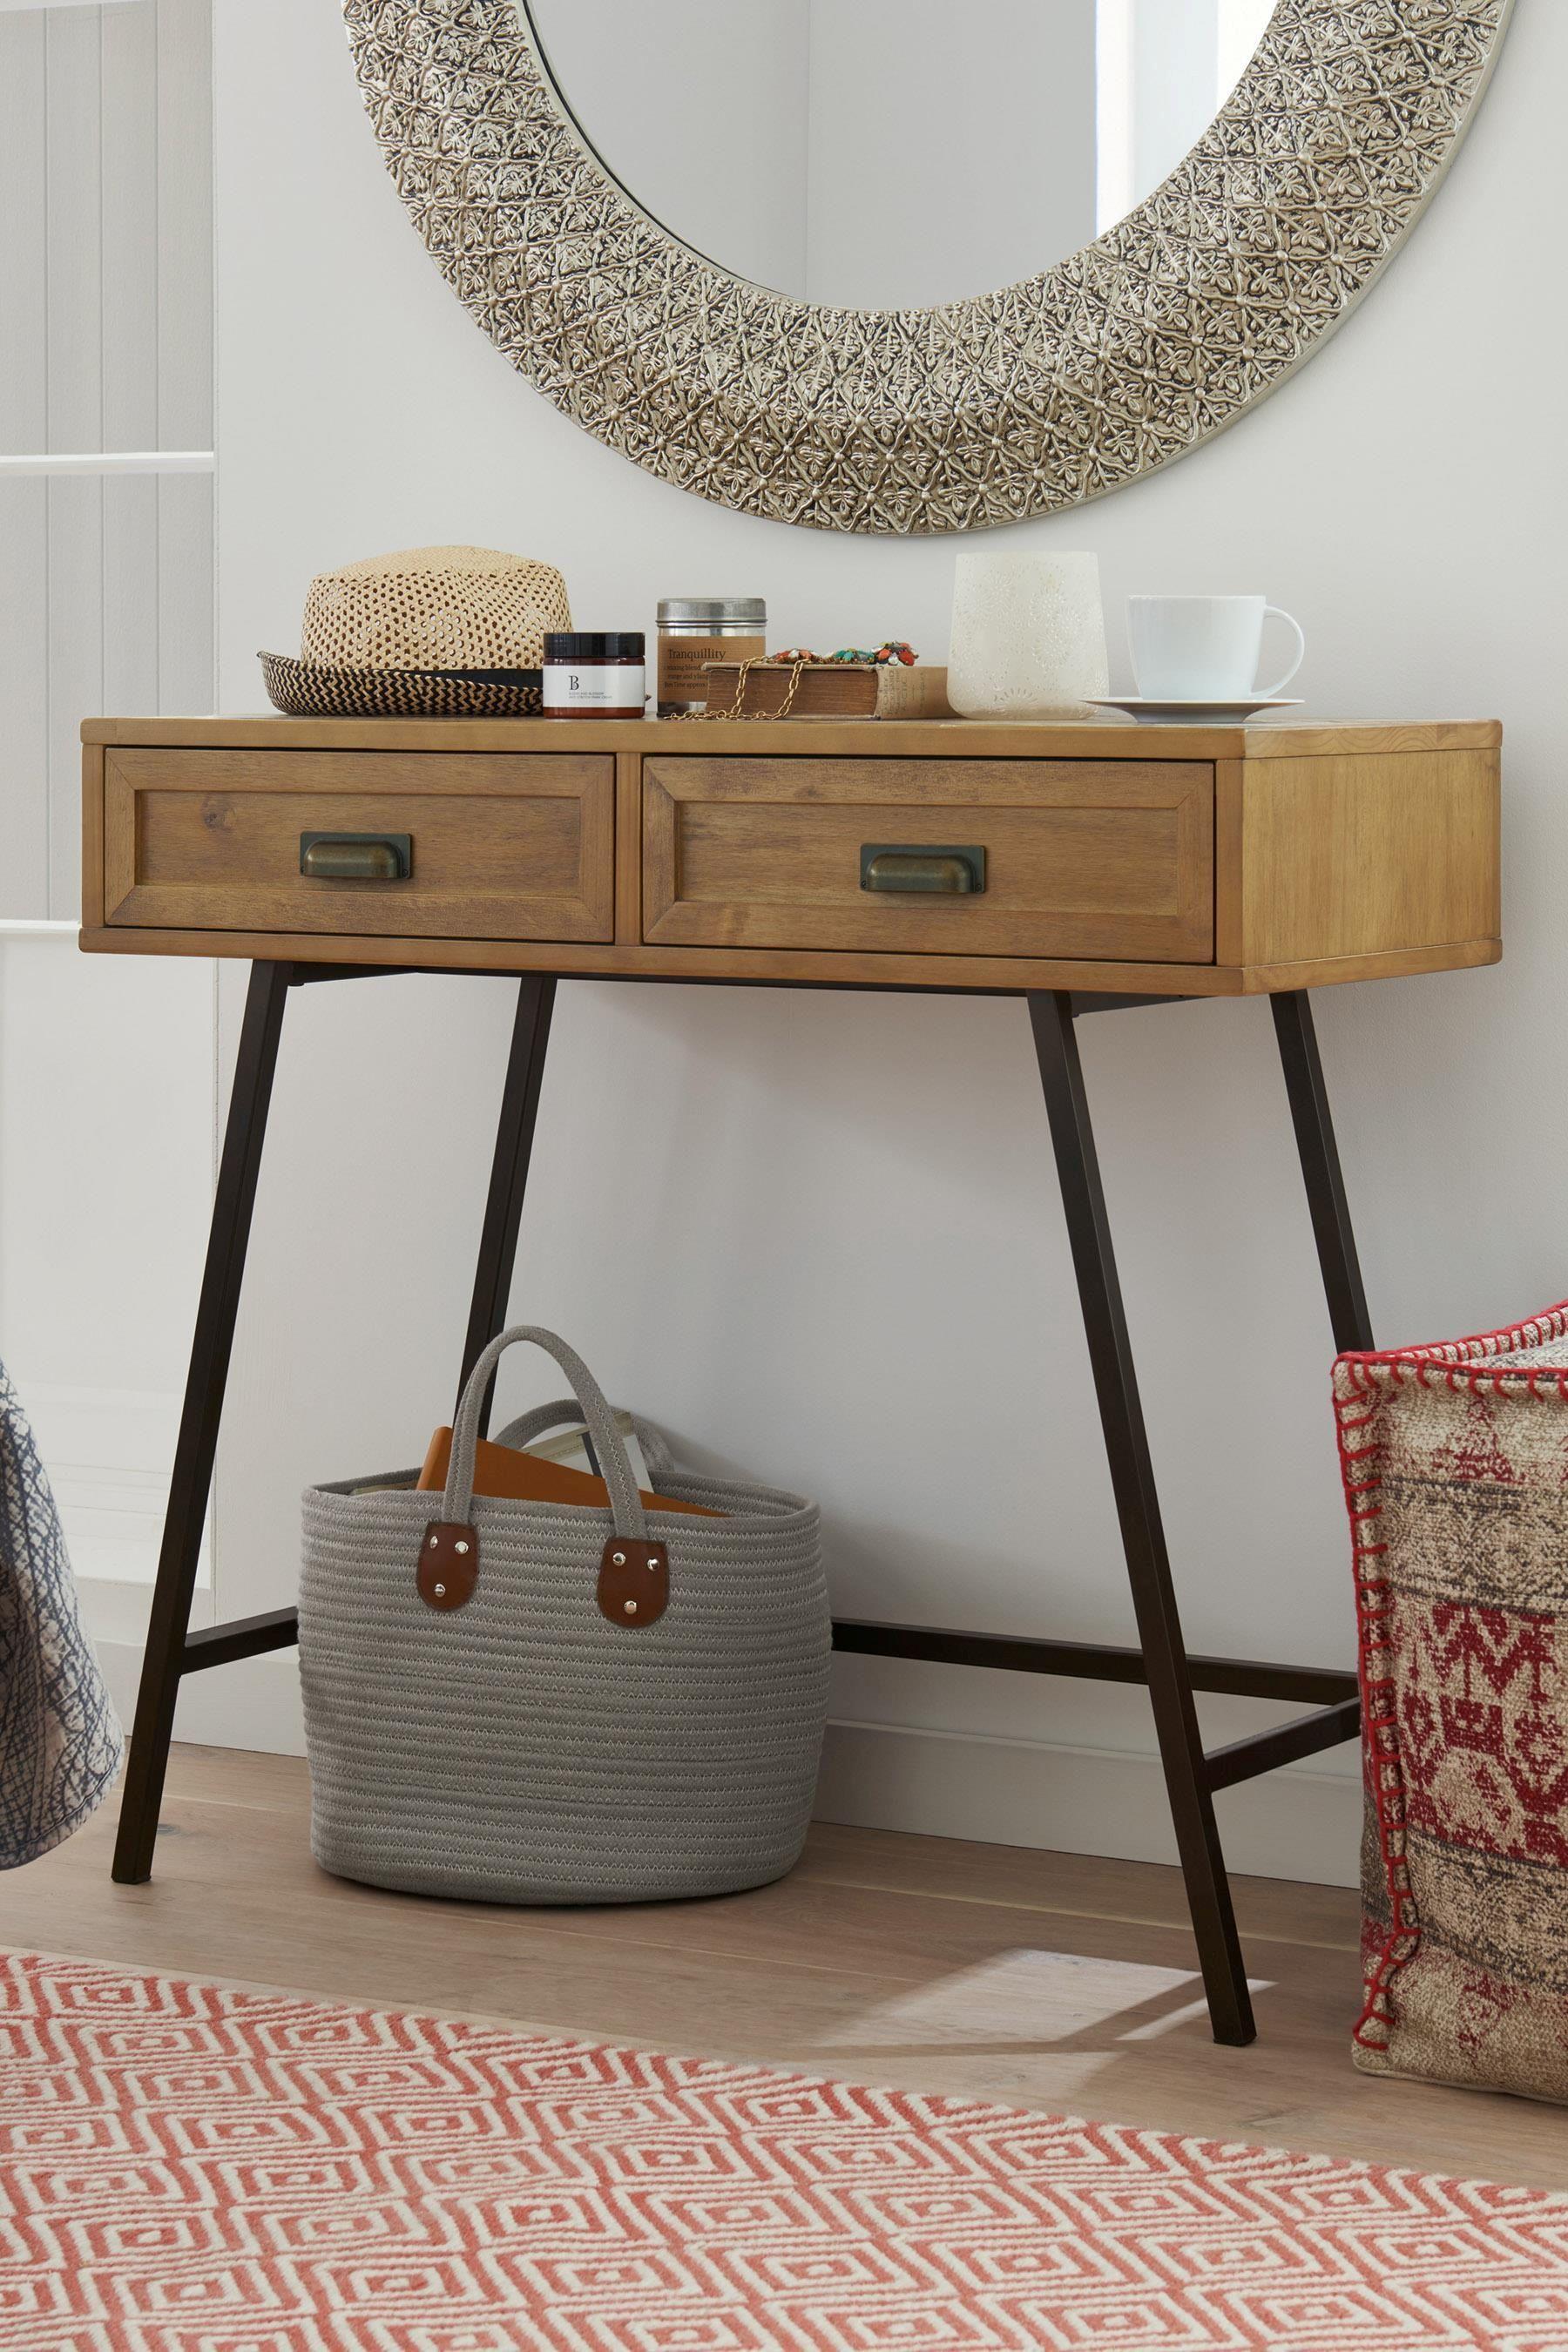 Wohndesign bilder mit shop buy shoreditch solid pine console from the next uk online shop